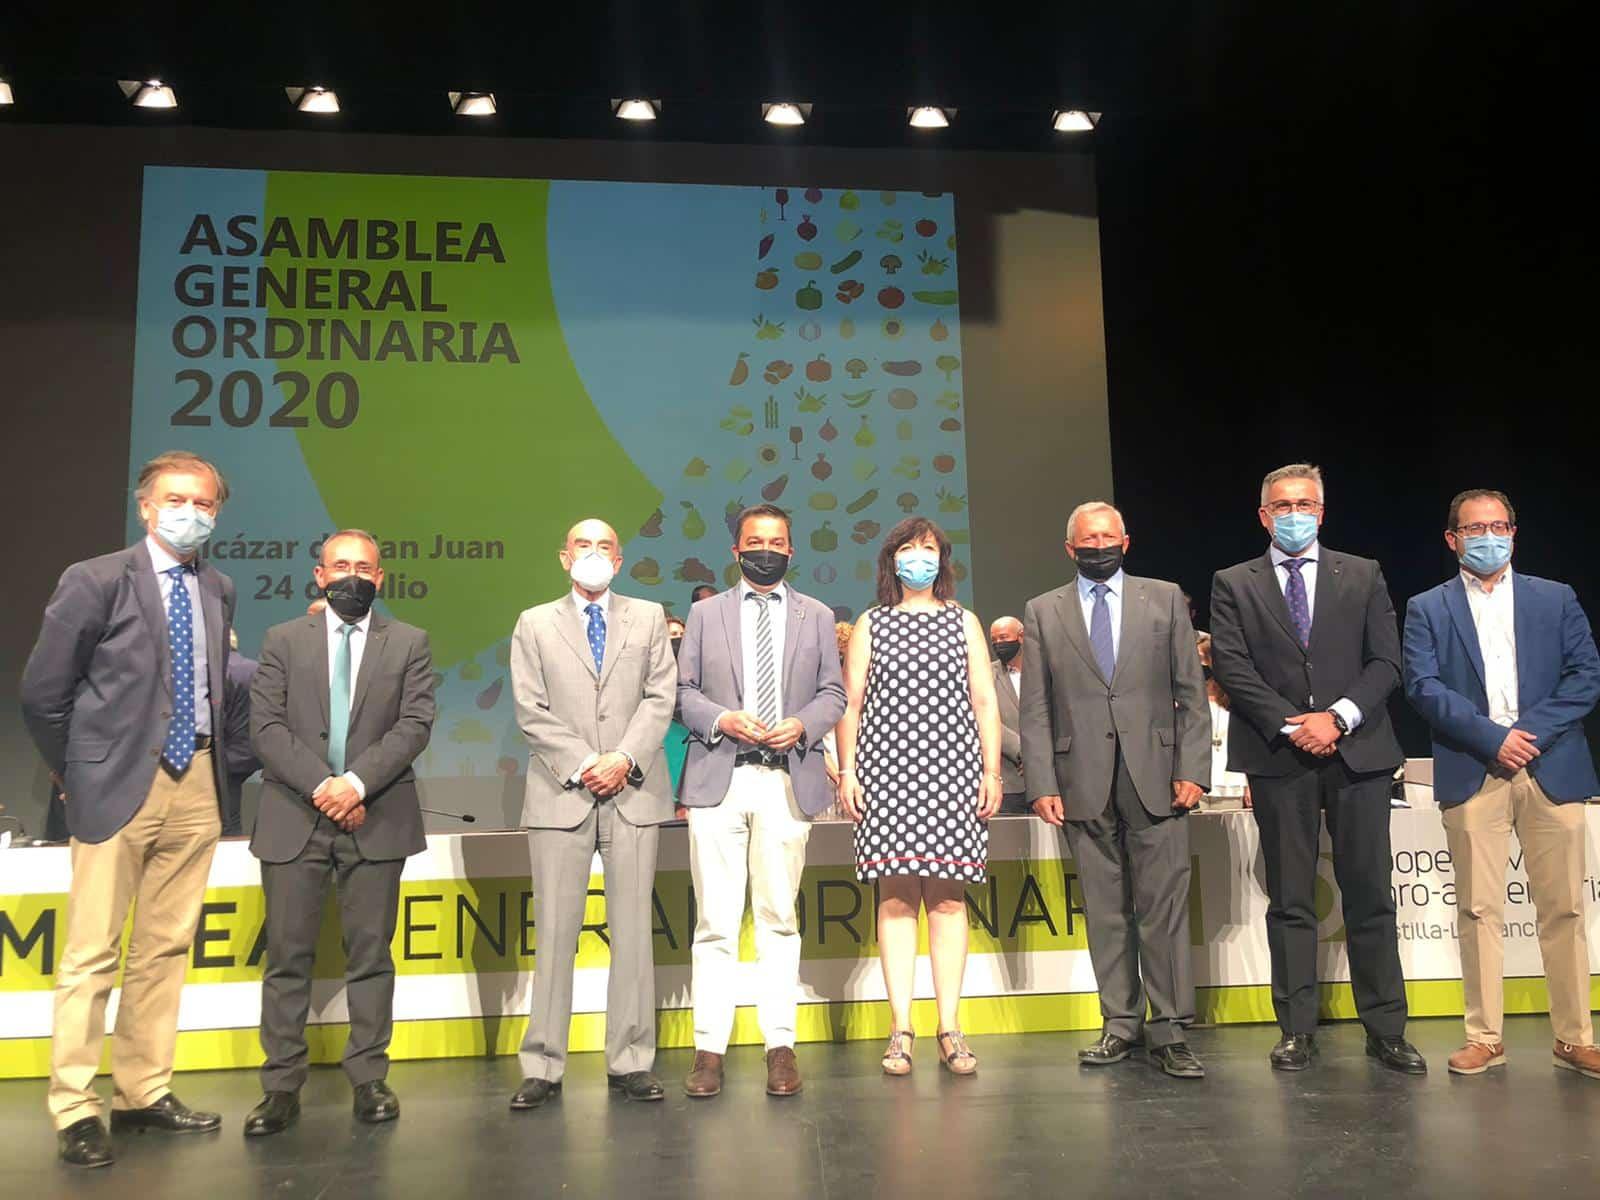 https://blog.globalcaja.es/wp-content/uploads/2020/07/asamblea-Agro-alimentarias-CLM.jpg